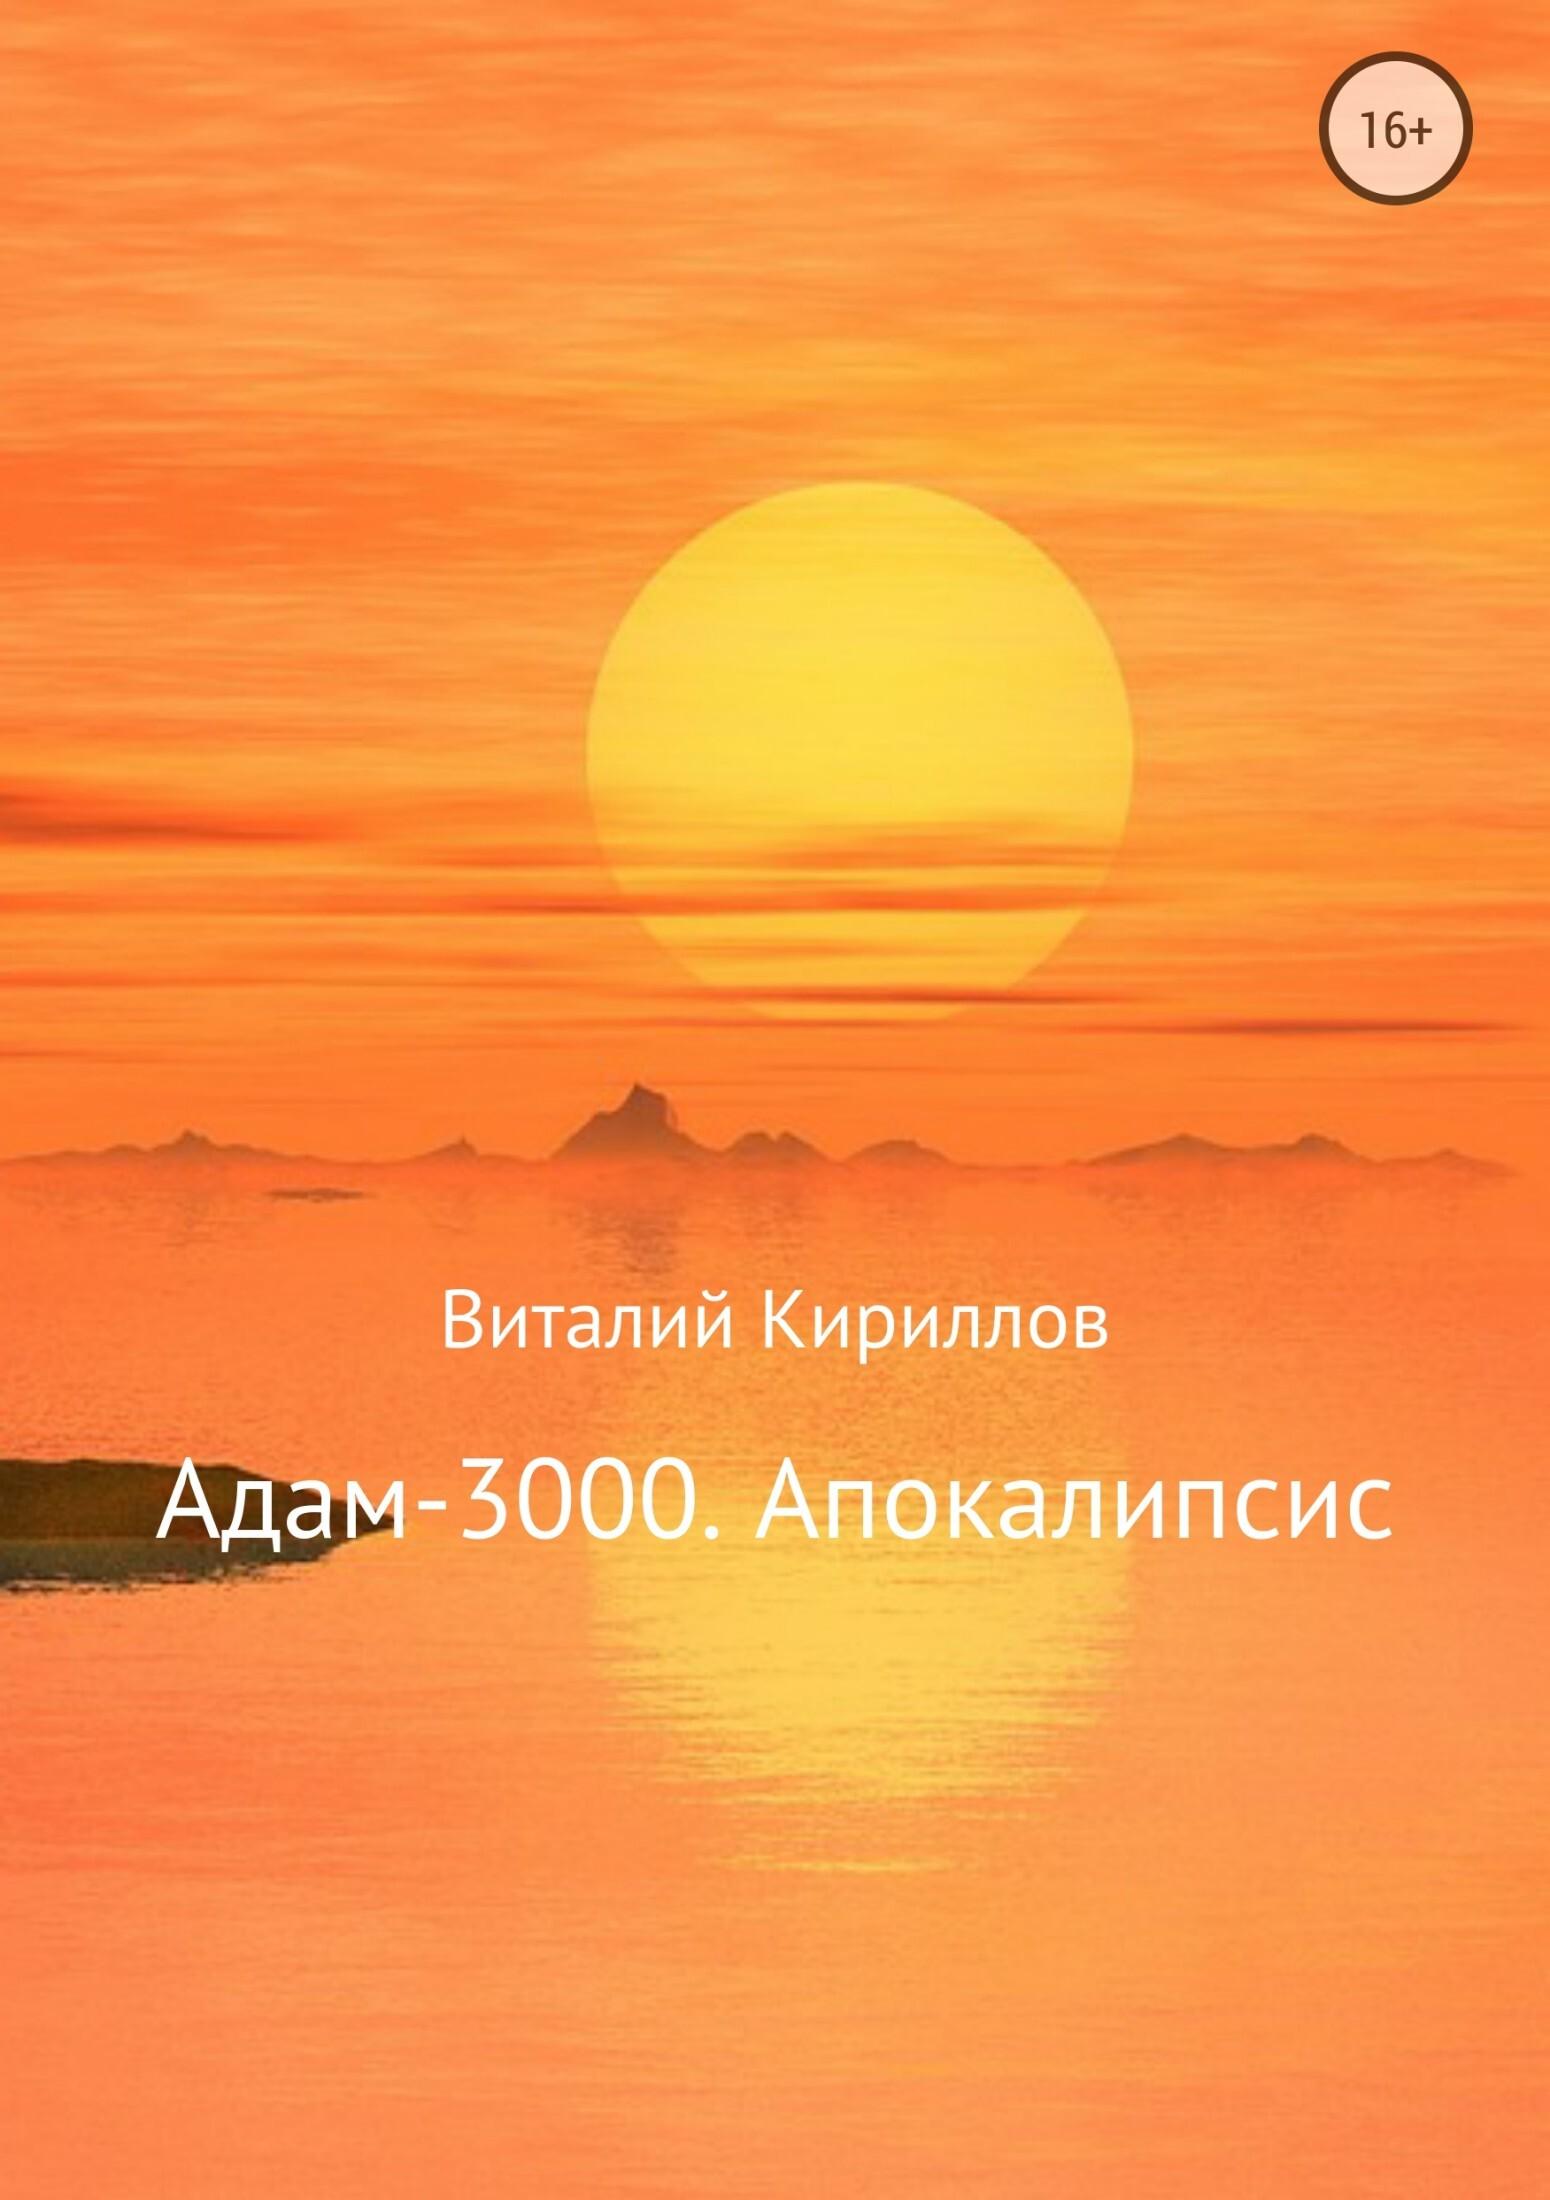 Виталий Александрович Кириллов Адам-3000. Апокалипсис виталий александрович кириллов антраст белый город